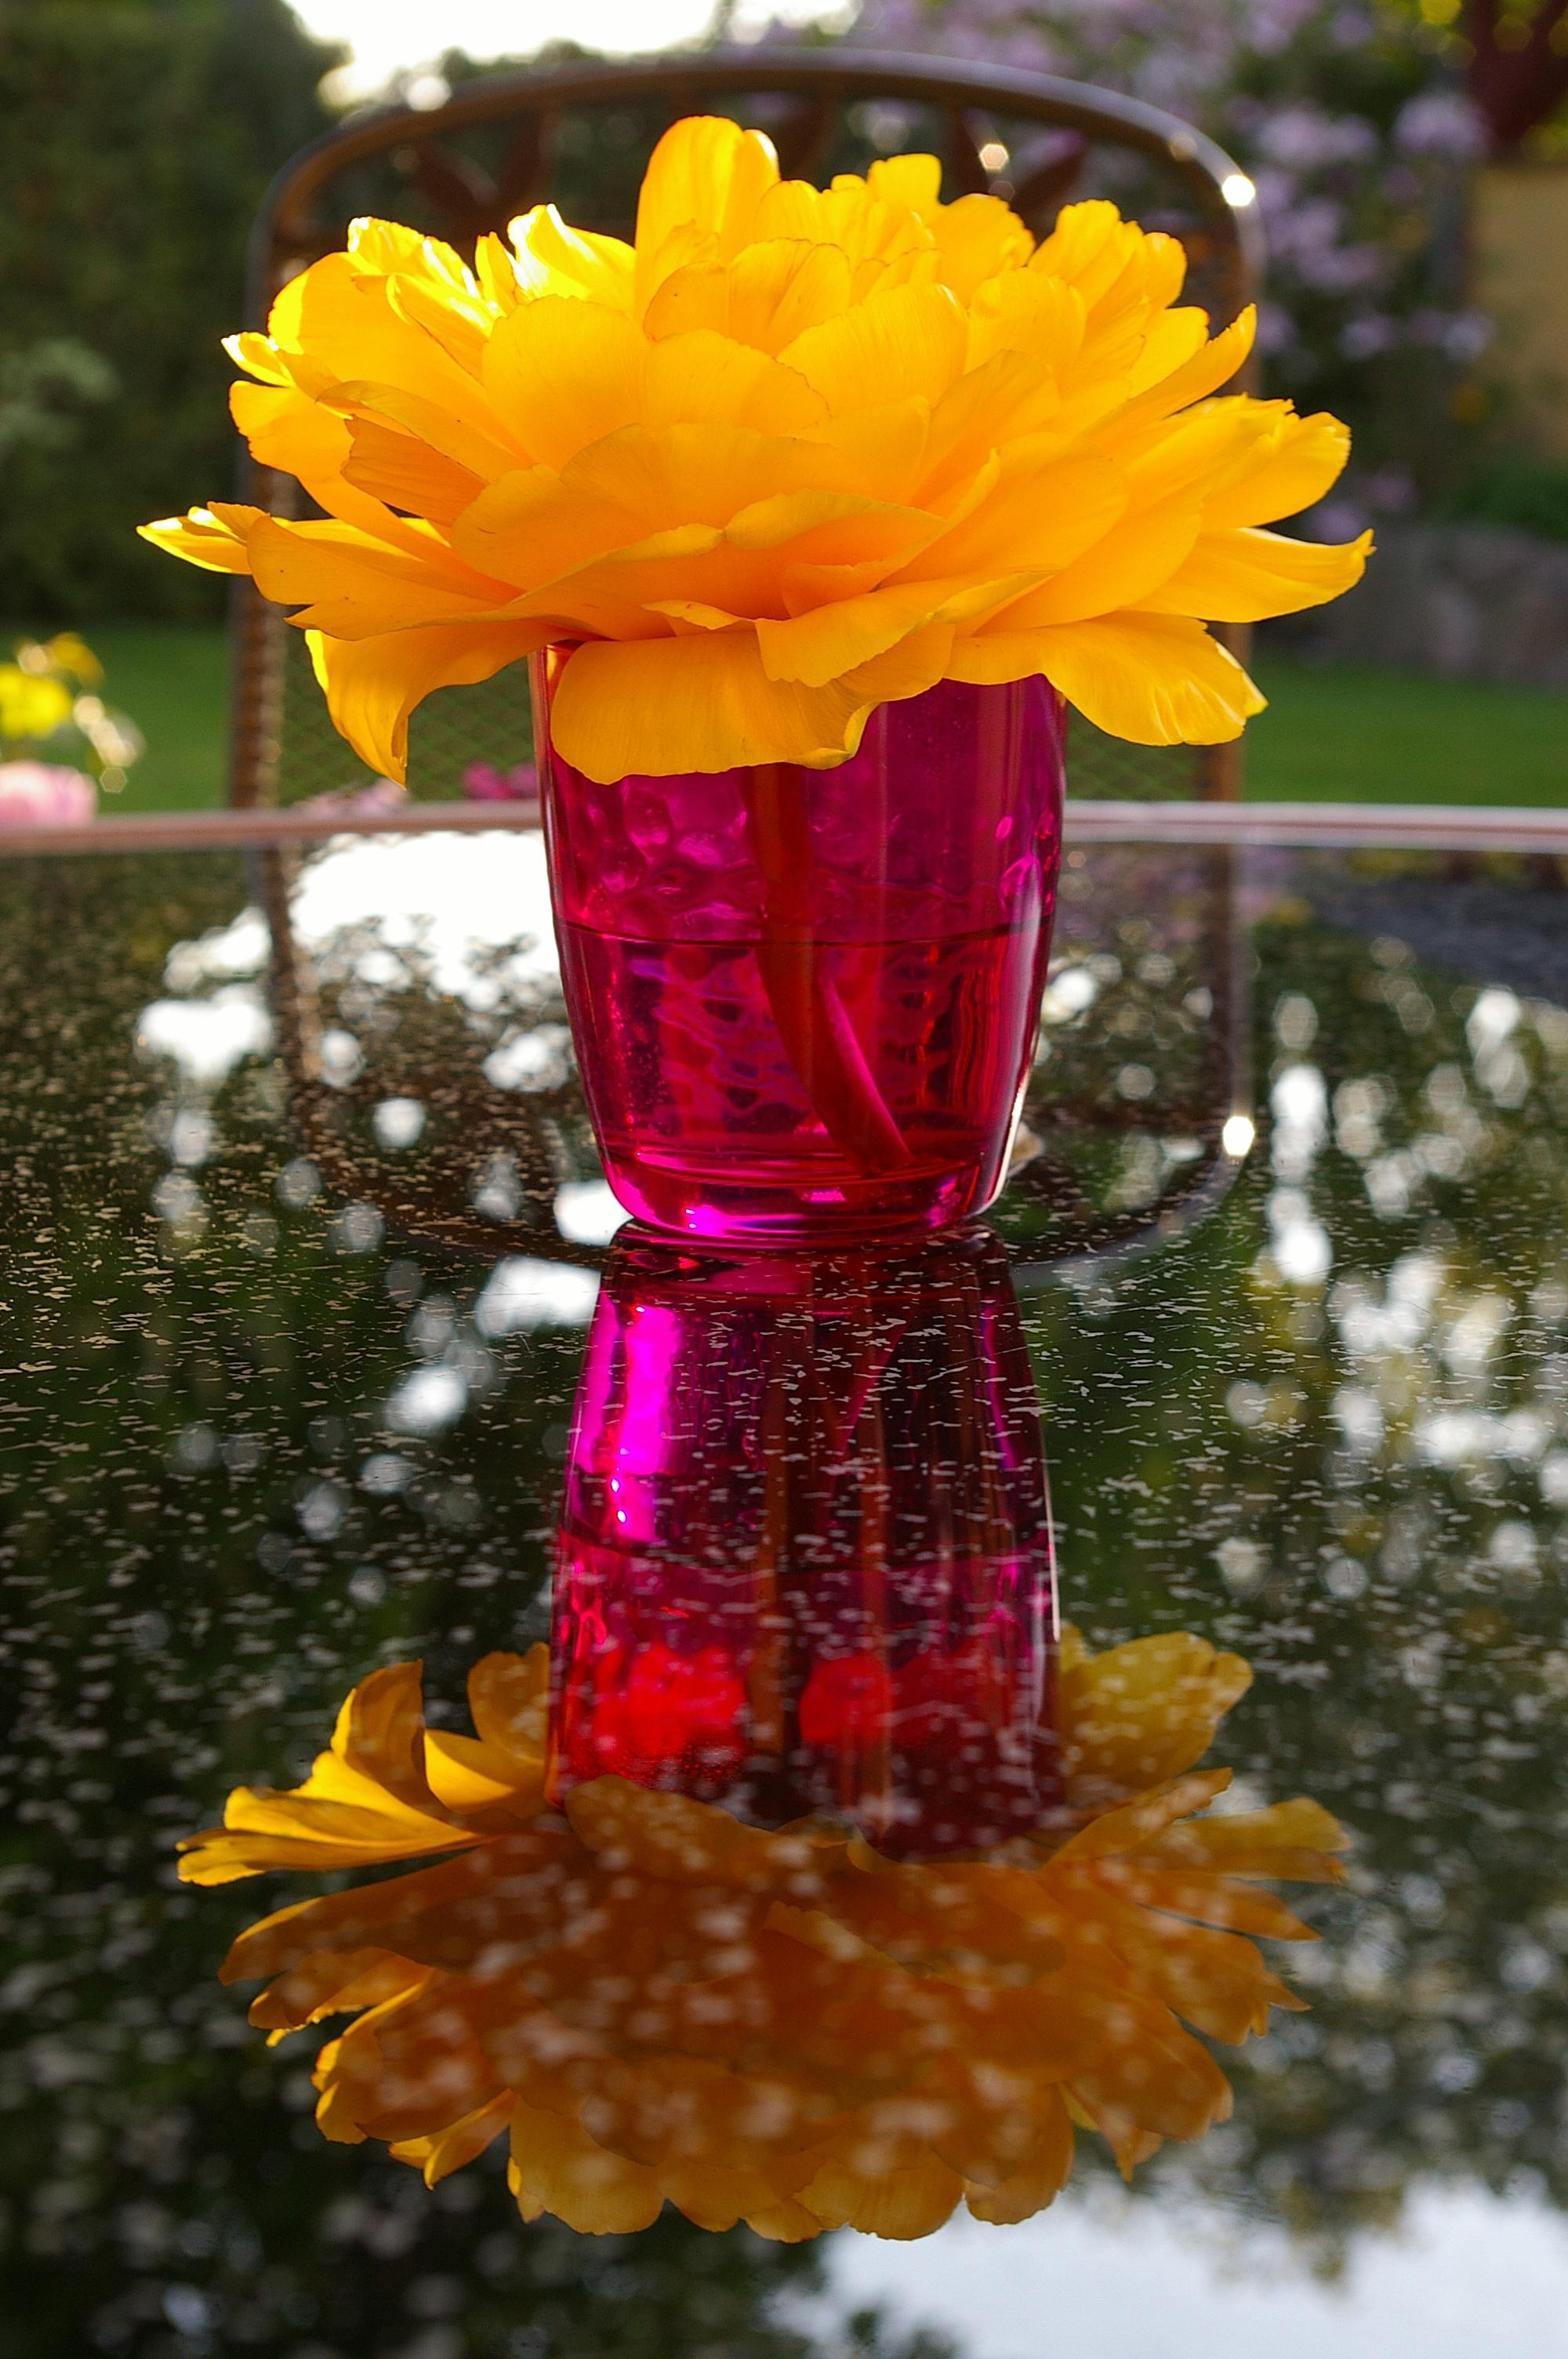 Free Images : nature, blossom, petal, floral, tulip, vase, red ...